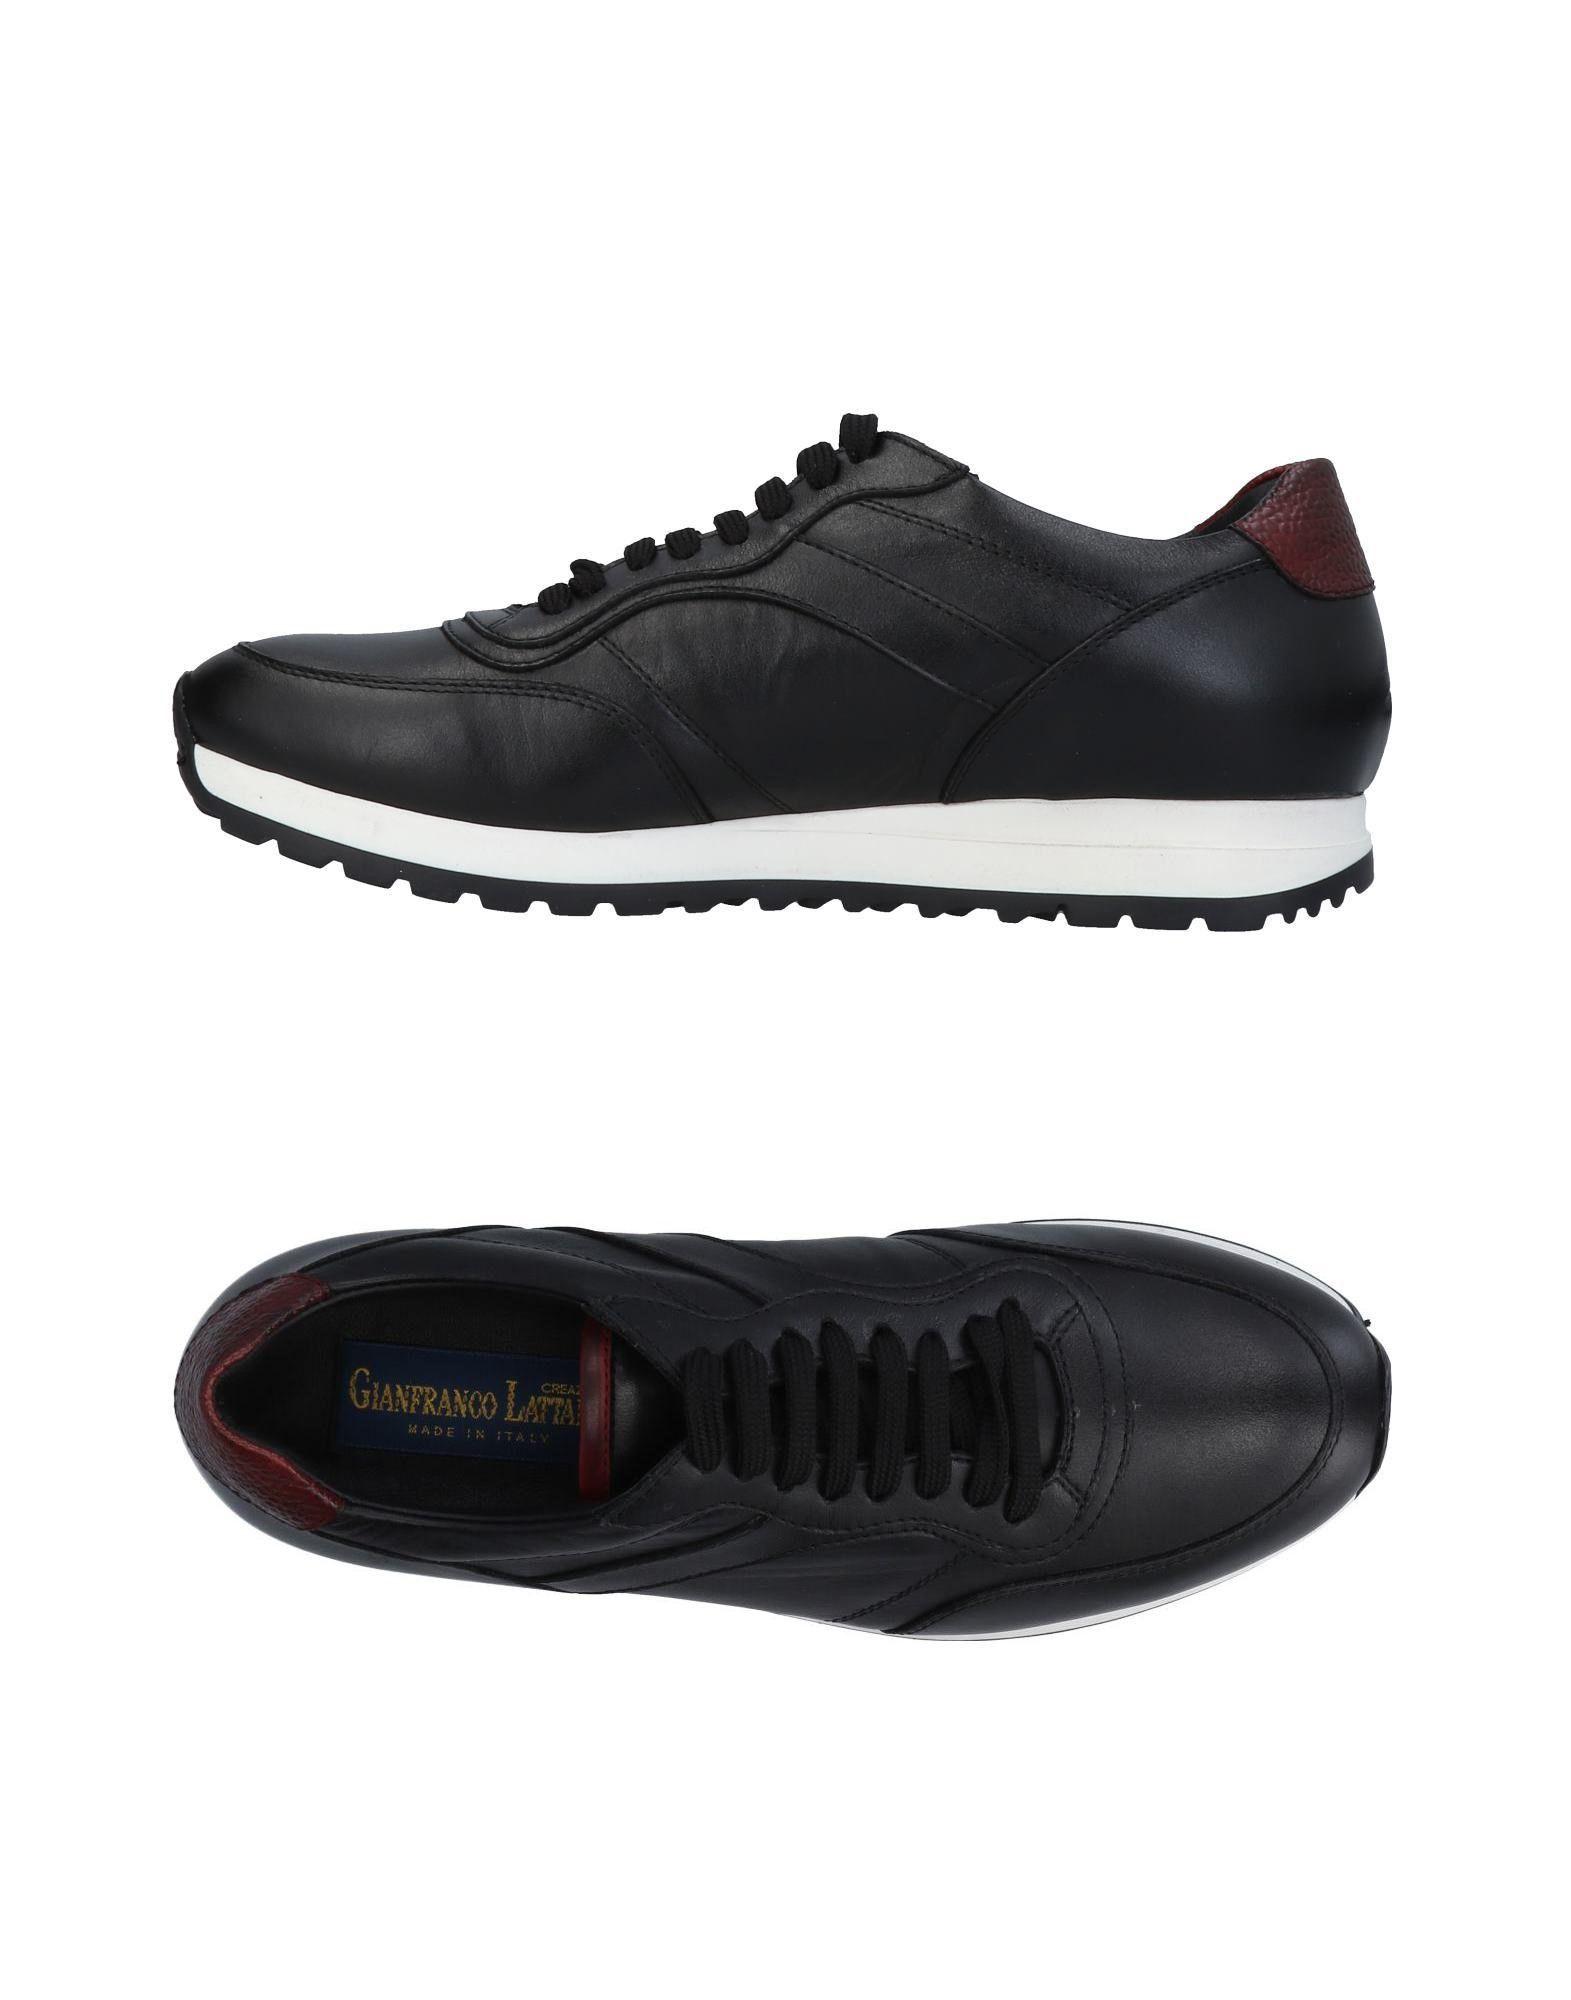 Sneakers Gianfranco Lattanzi Homme - Sneakers Gianfranco Lattanzi  Noir Super rabais